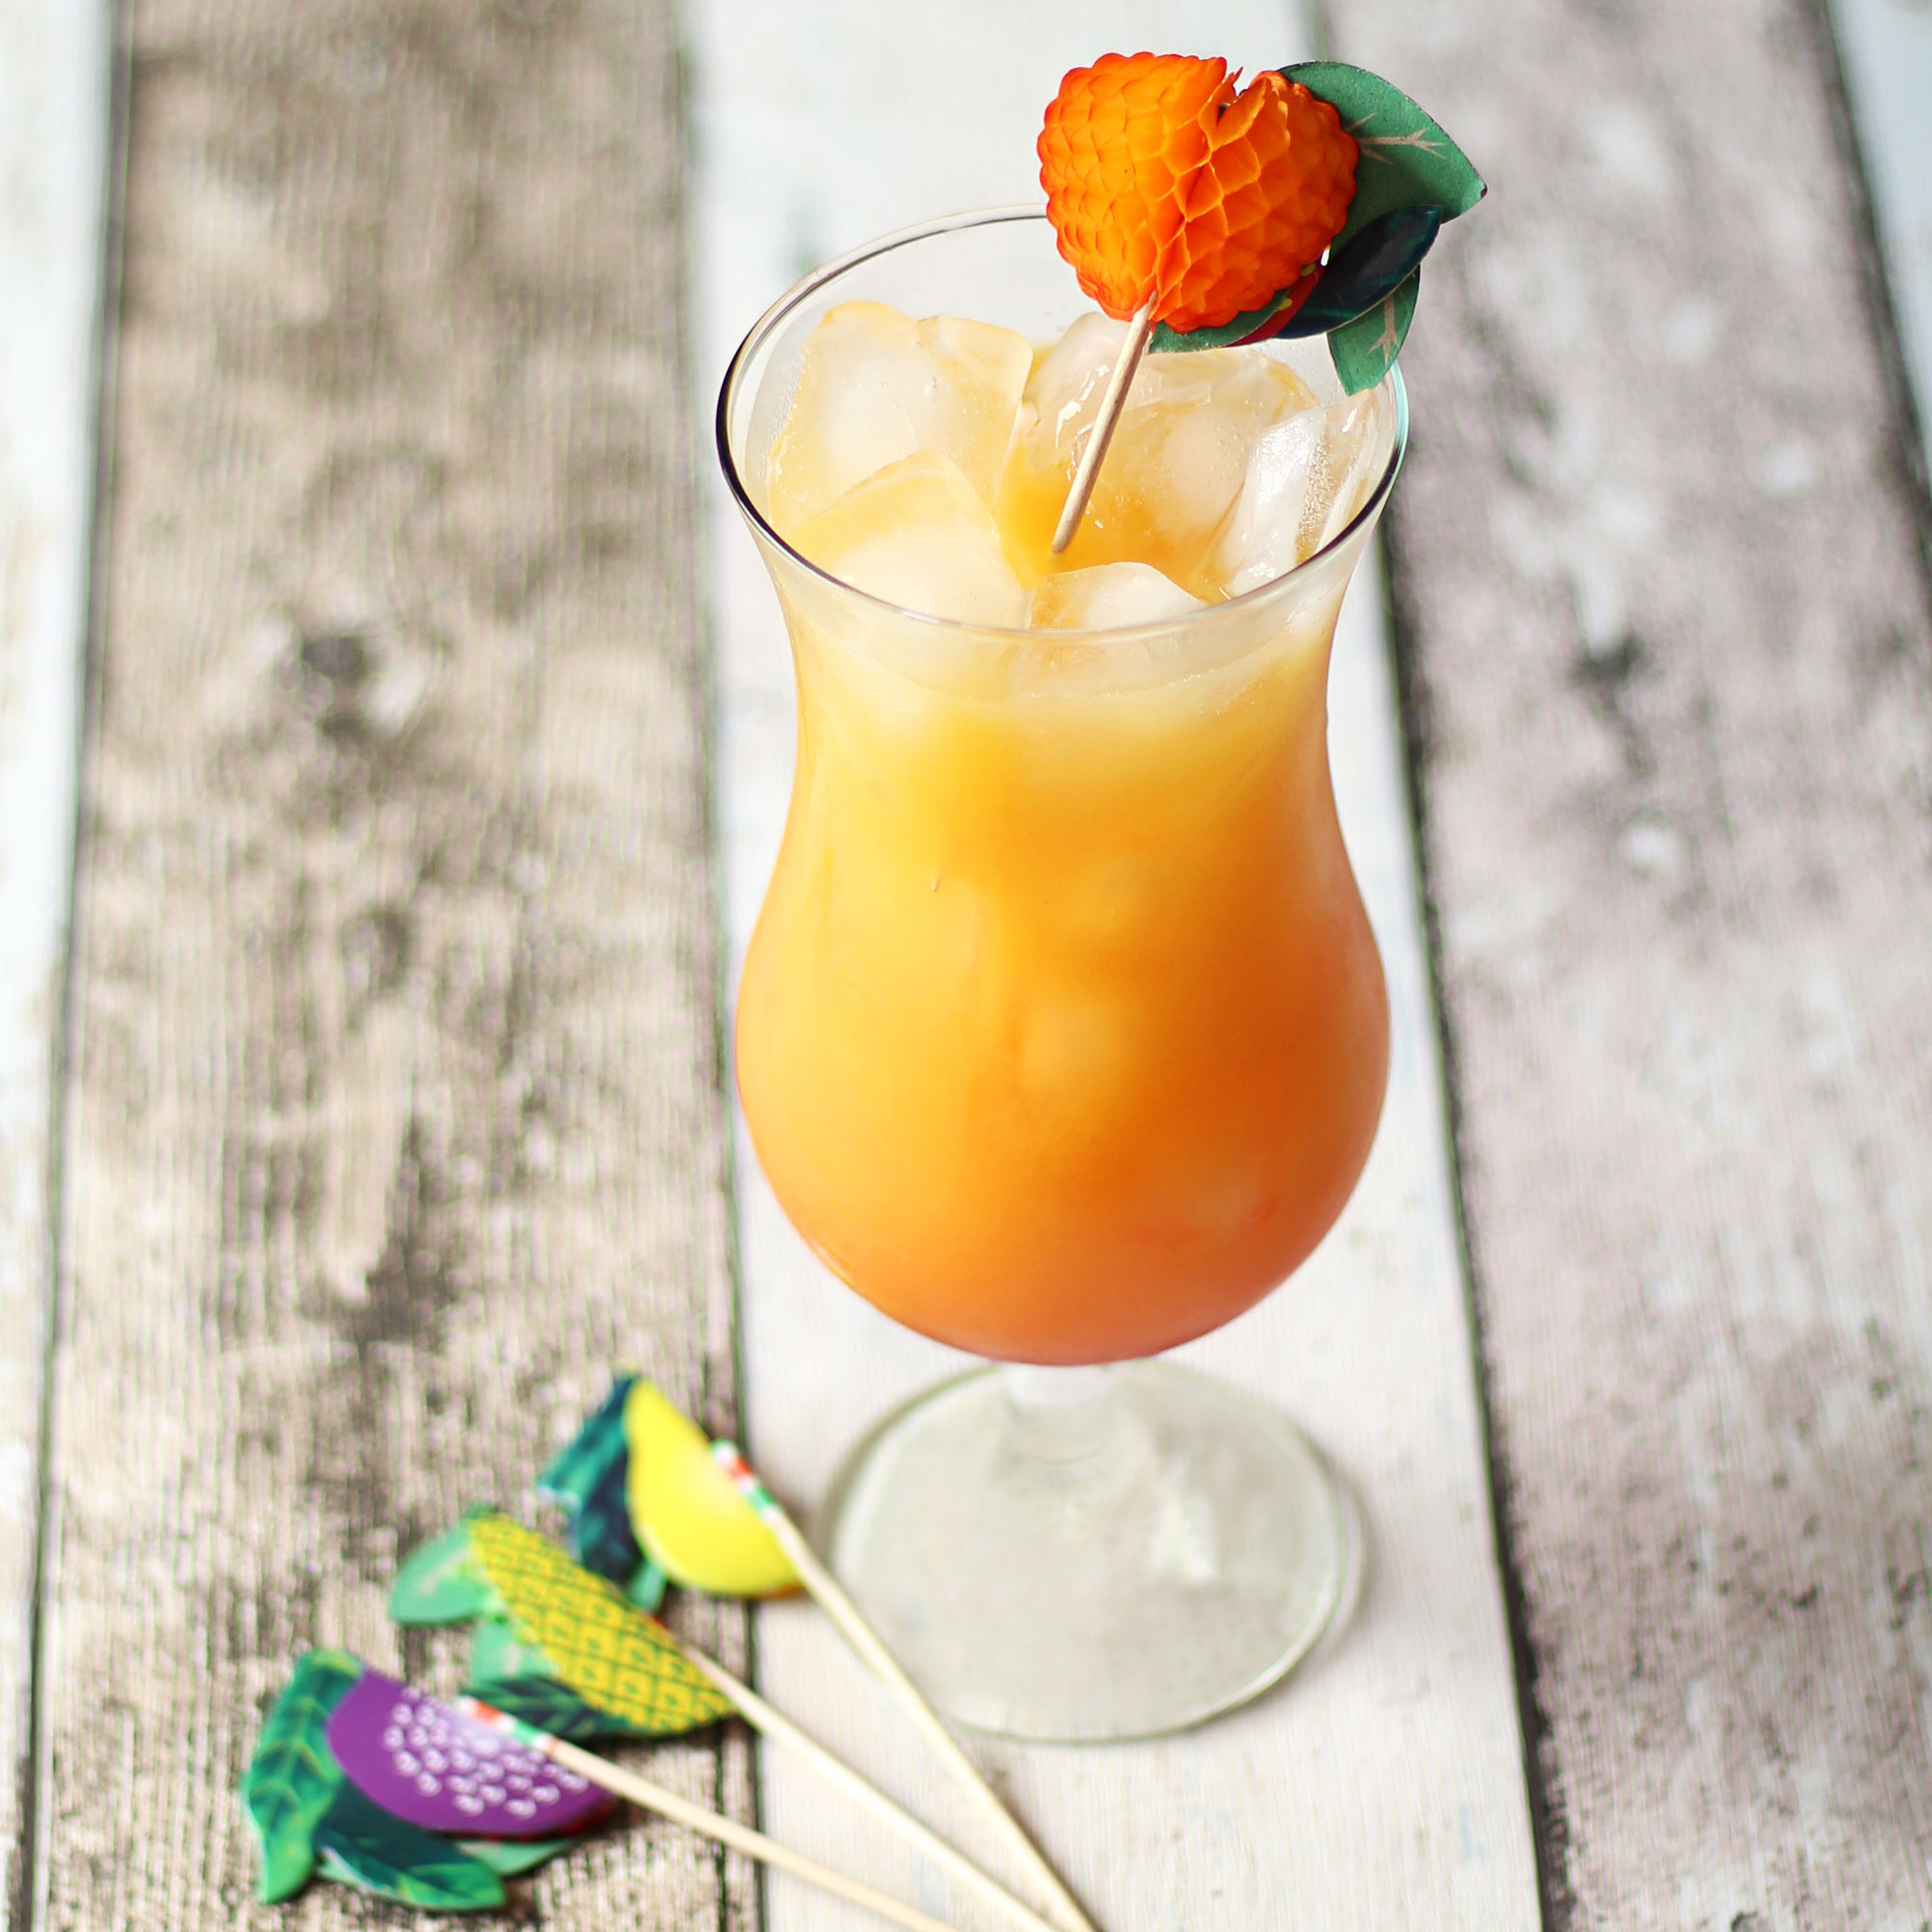 Novelty Fruit Cocktail Stick Decorations At Drinkstuff